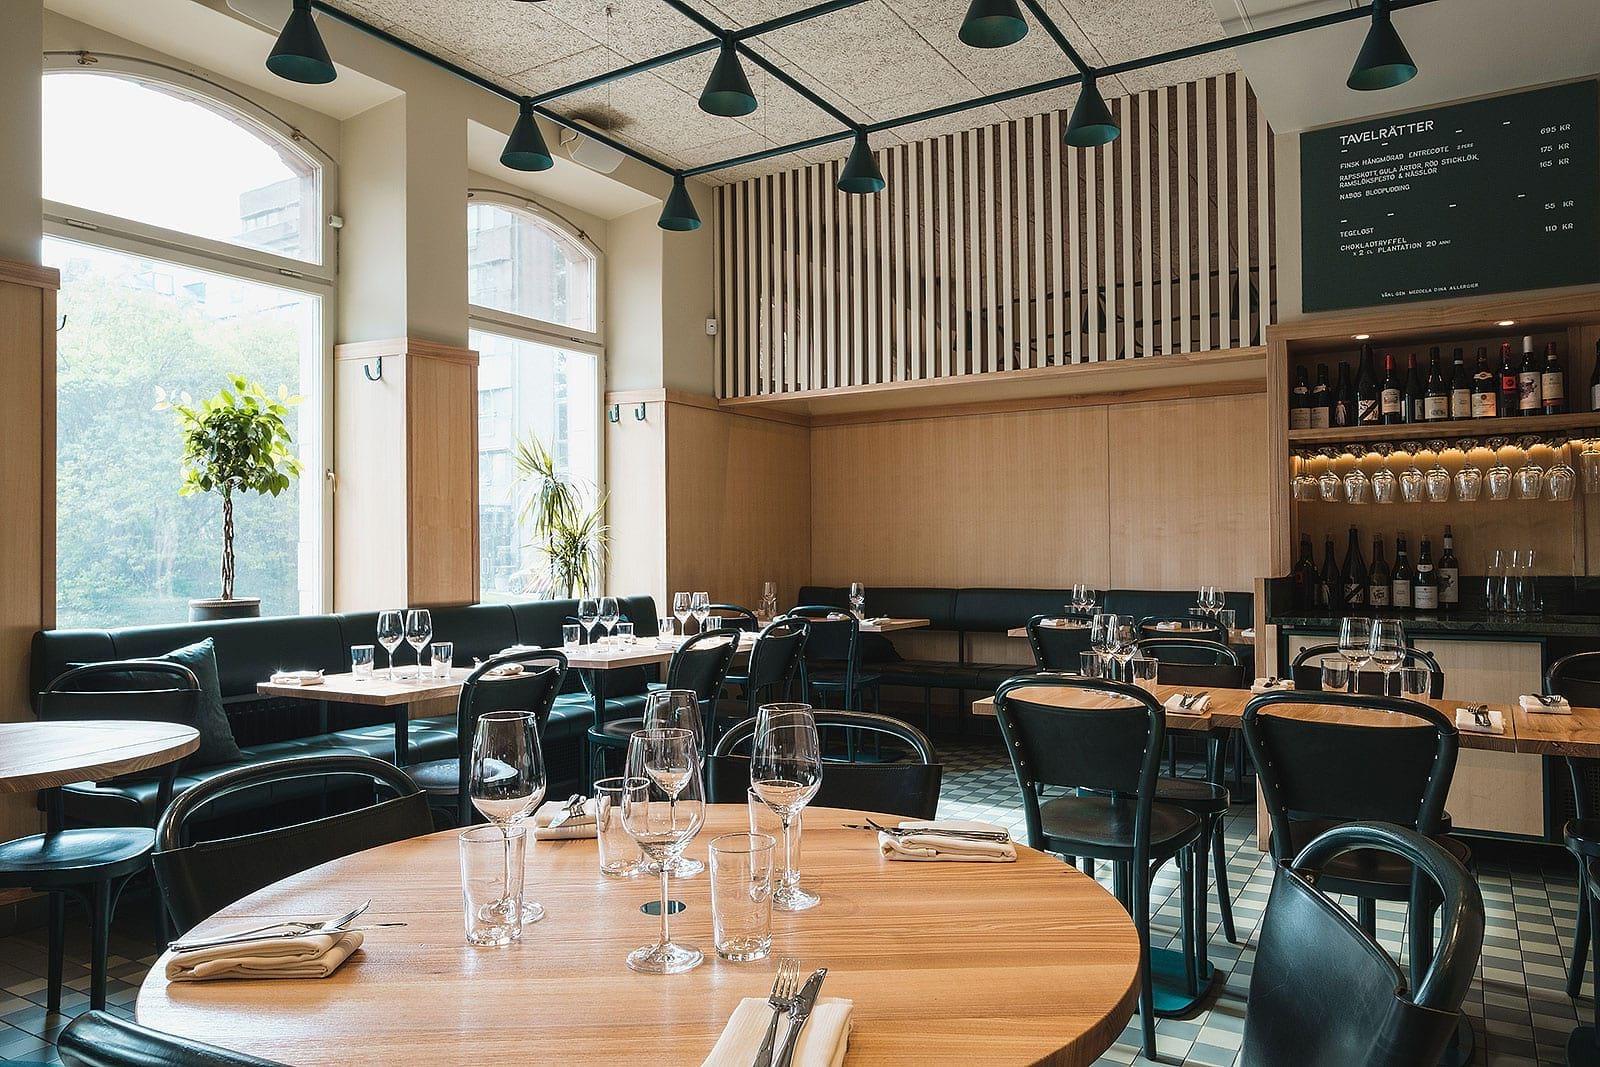 Nabo restaurang stockholm